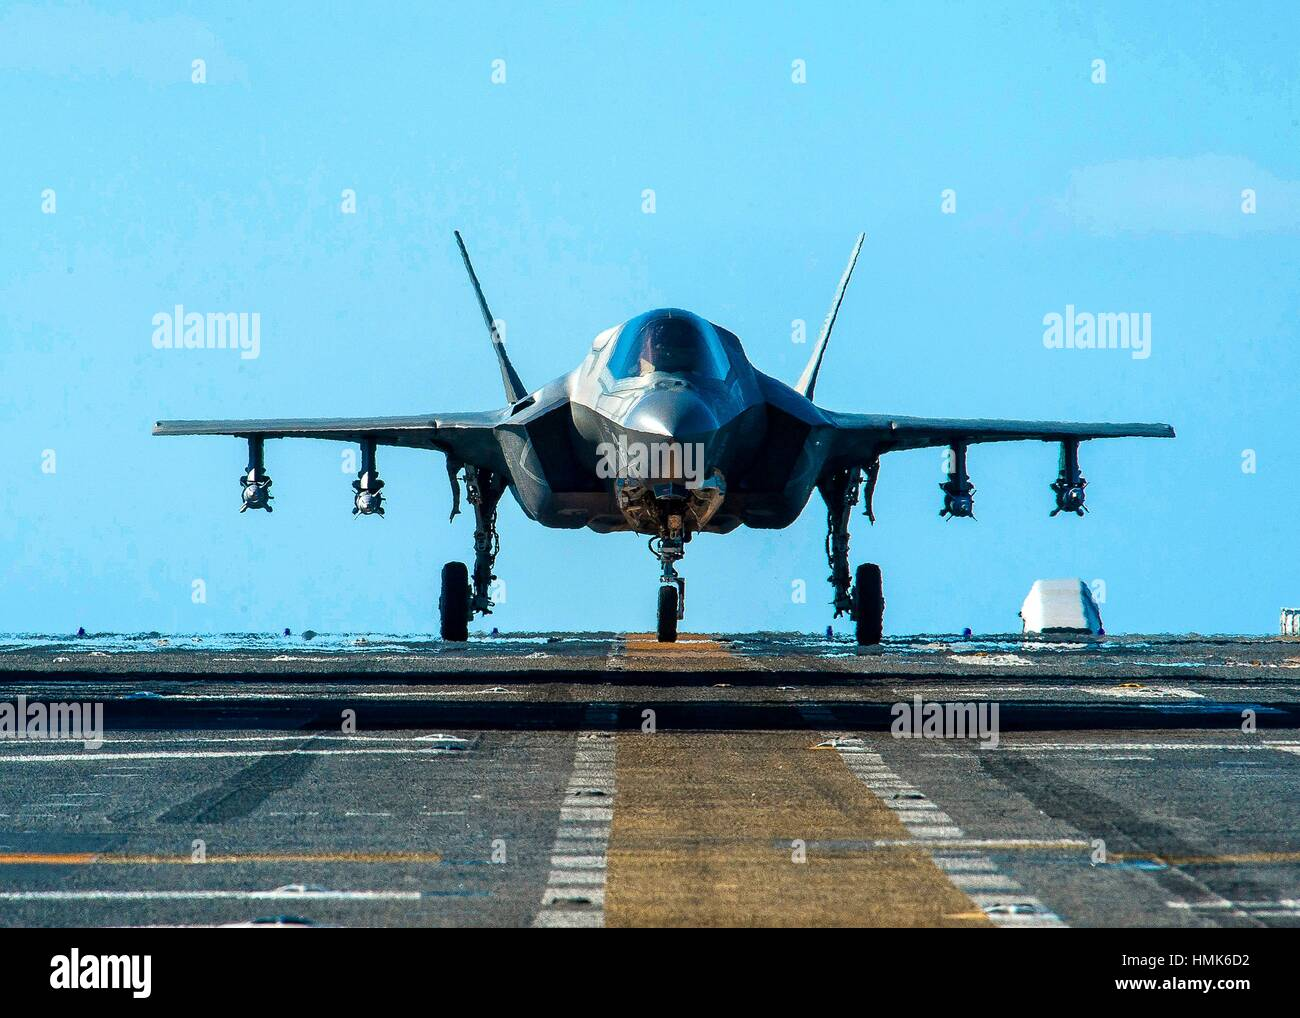 PACIFIC OCEAN (Nov. 5, 2016) An F-35B Lightning II aircraft equipped with inert 500-pound GBU-12 Paveway II laser - Stock Image